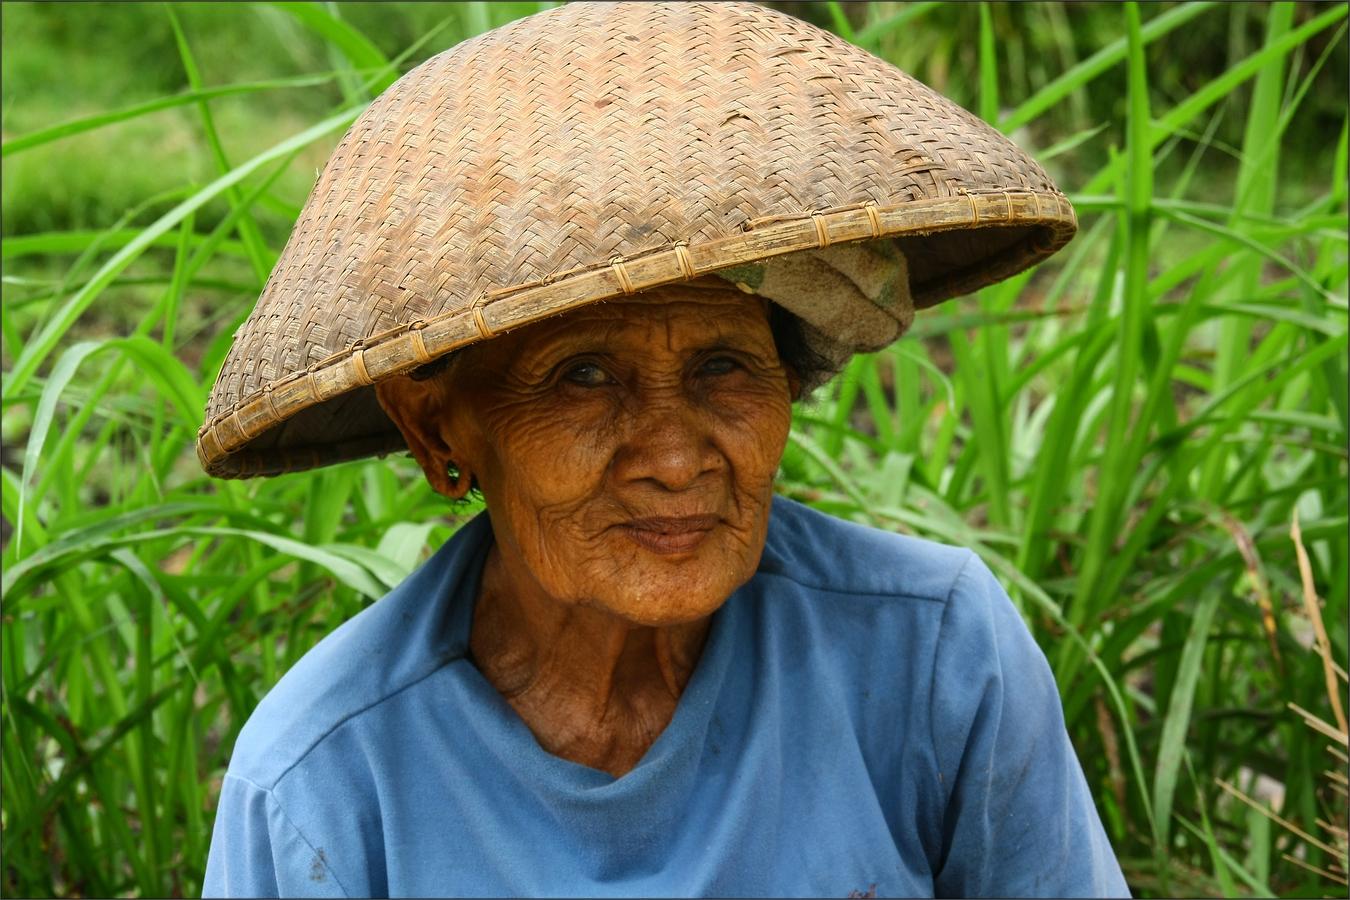 * Balinesische Reisbäuerin *